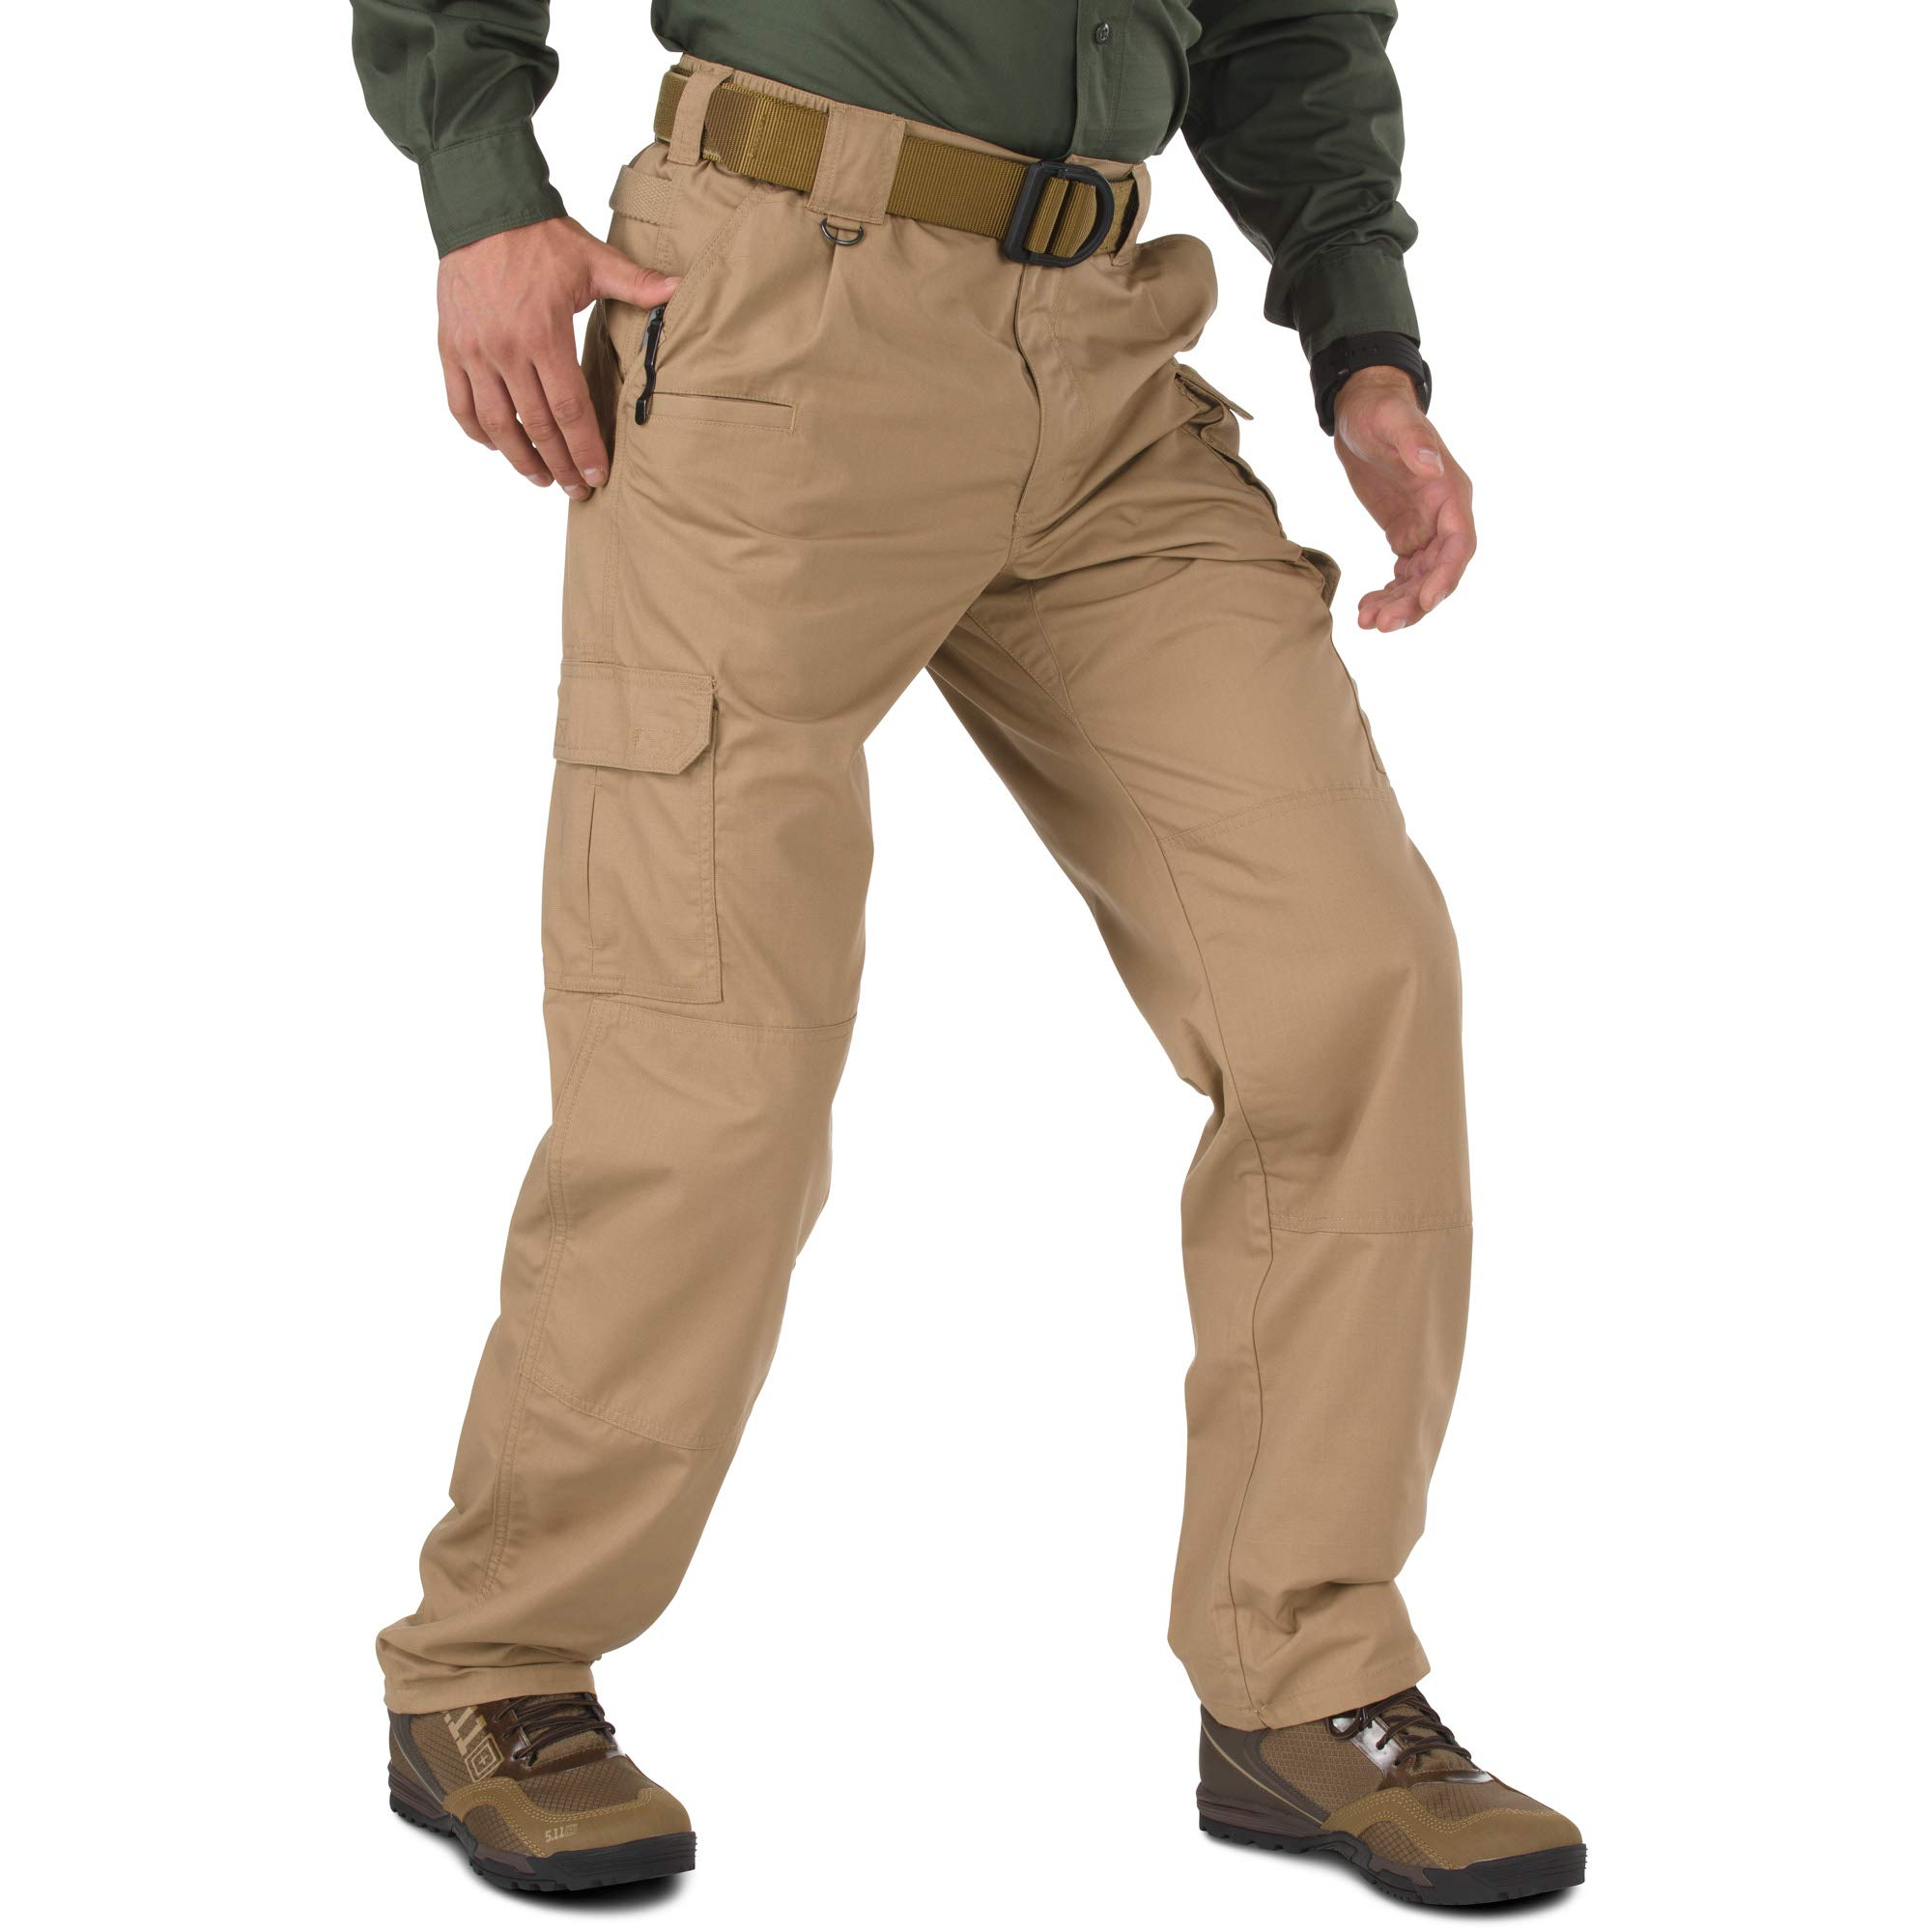 5.11 Men's Taclite Pro Tactical Pants, Style 74273, Coyote, 46W Unhemmed